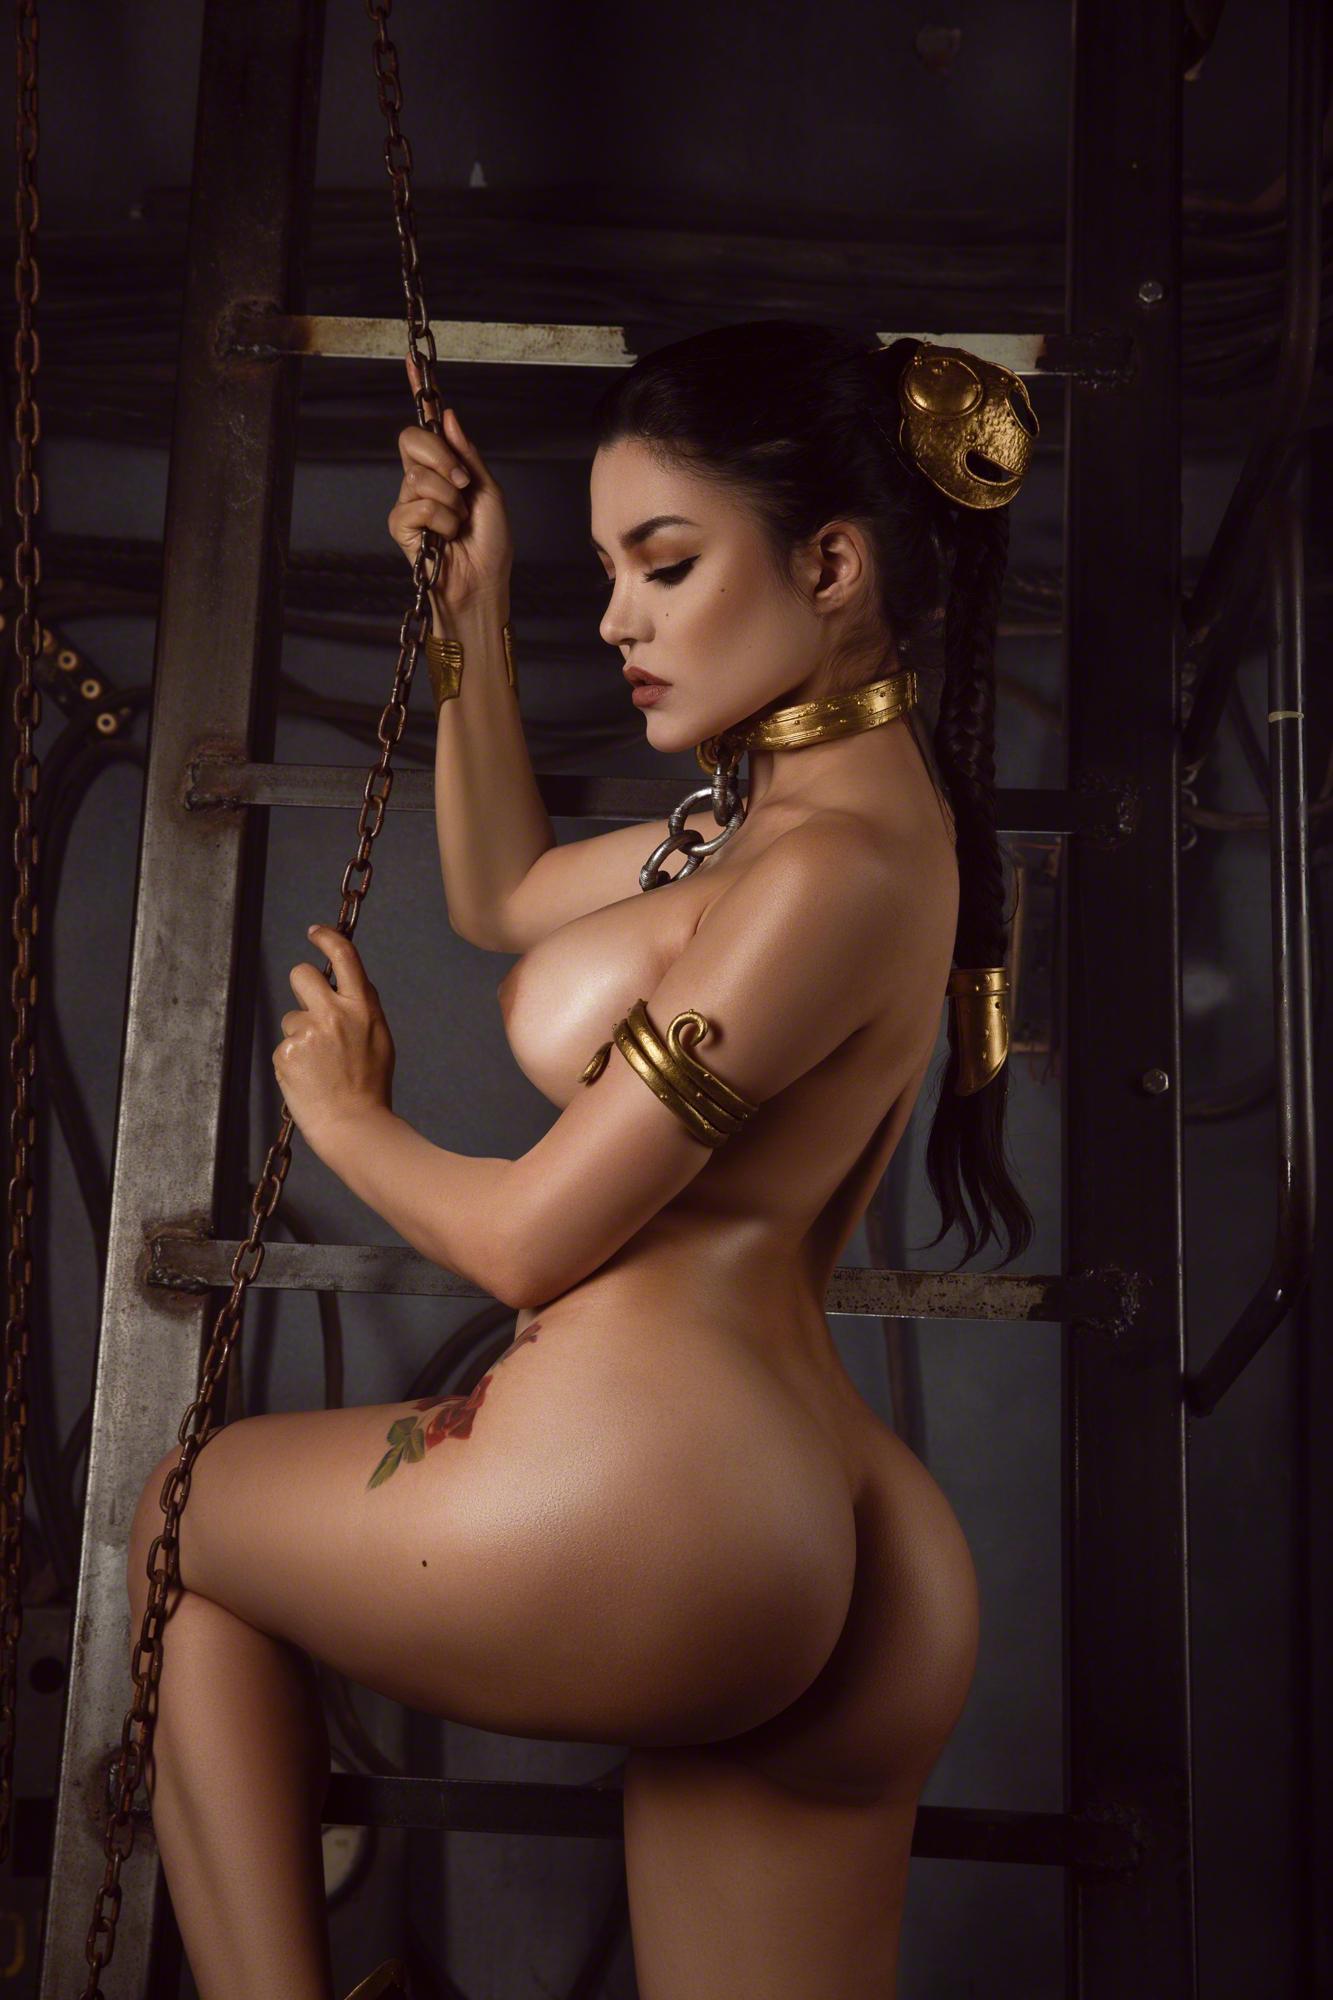 Kalinka Fox Nude Princess Leia Cosplay Set Leaked Nspvkn